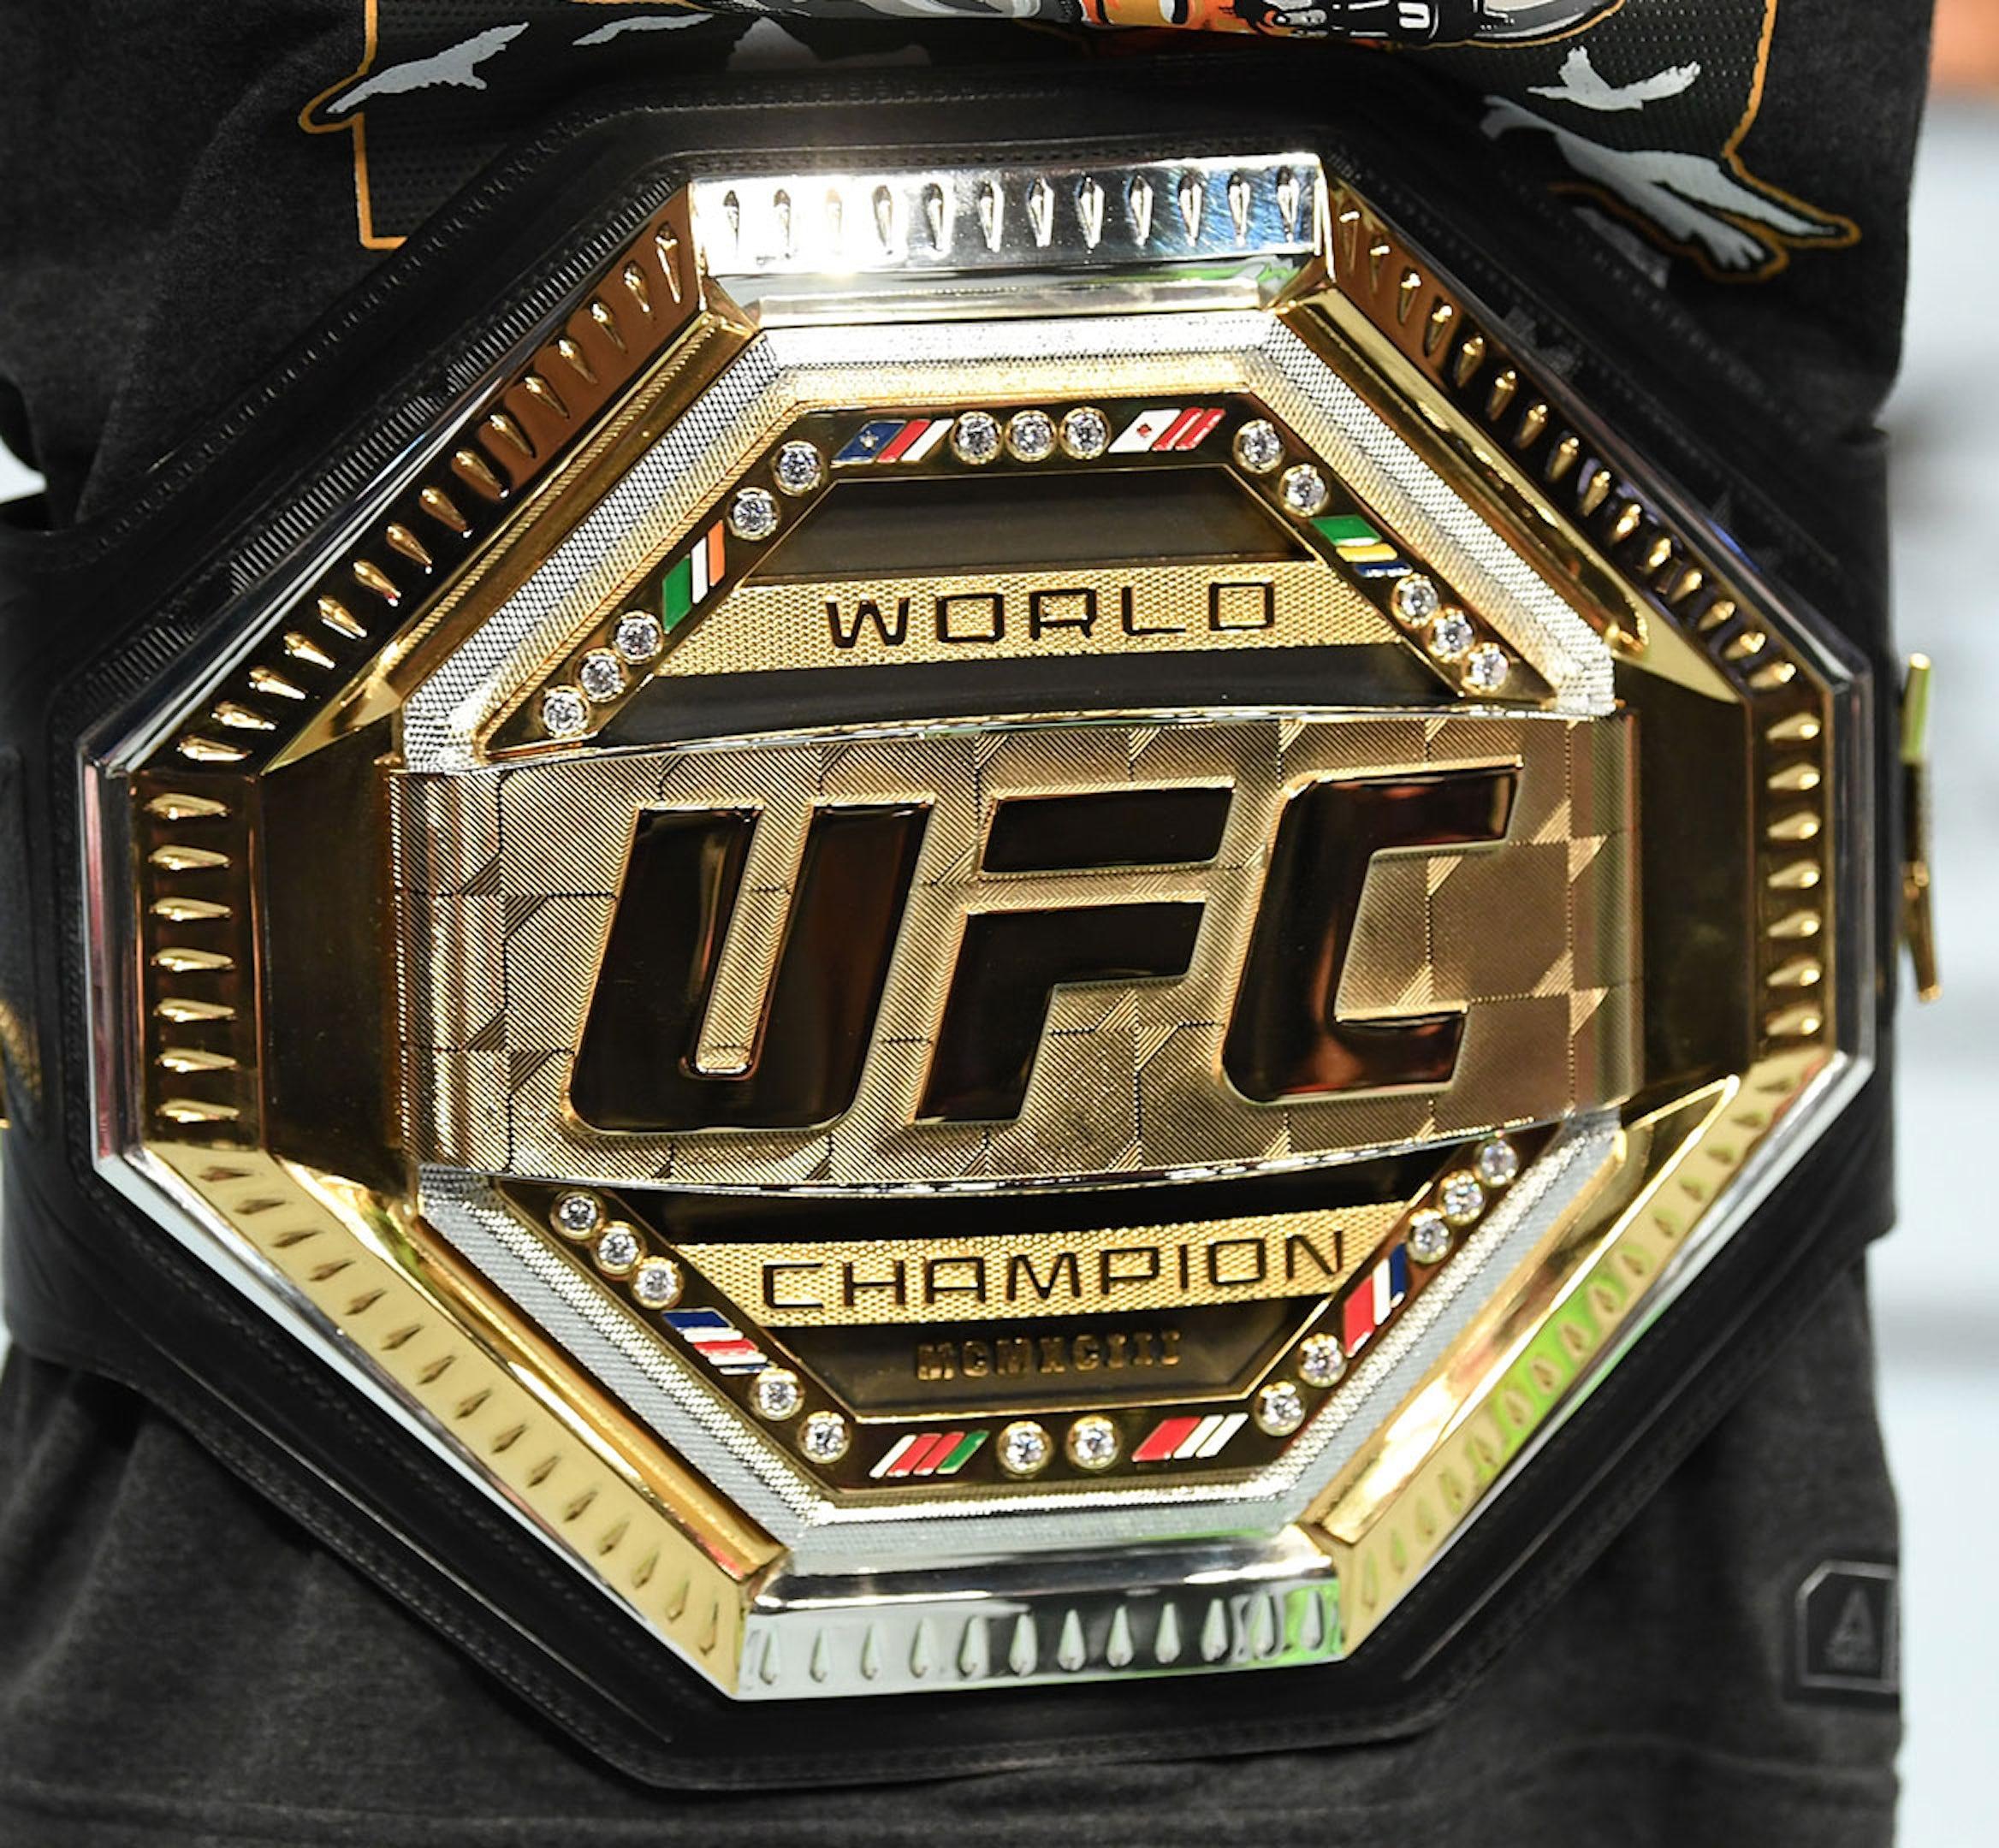 UFC champions hero